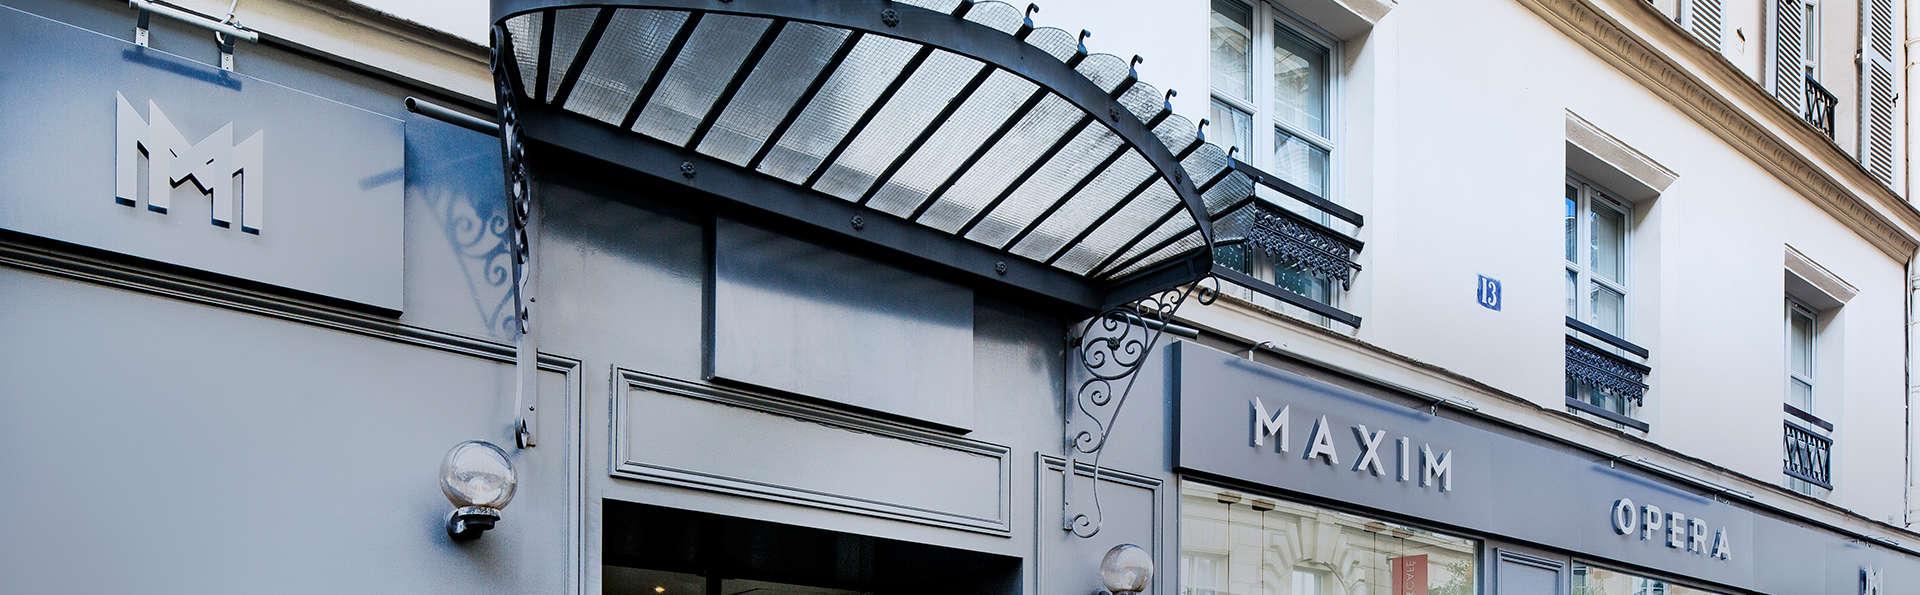 MAXIM Opéra (ex BW 1er Le Carre Folies Opéra) - EDIT_front1.jpg